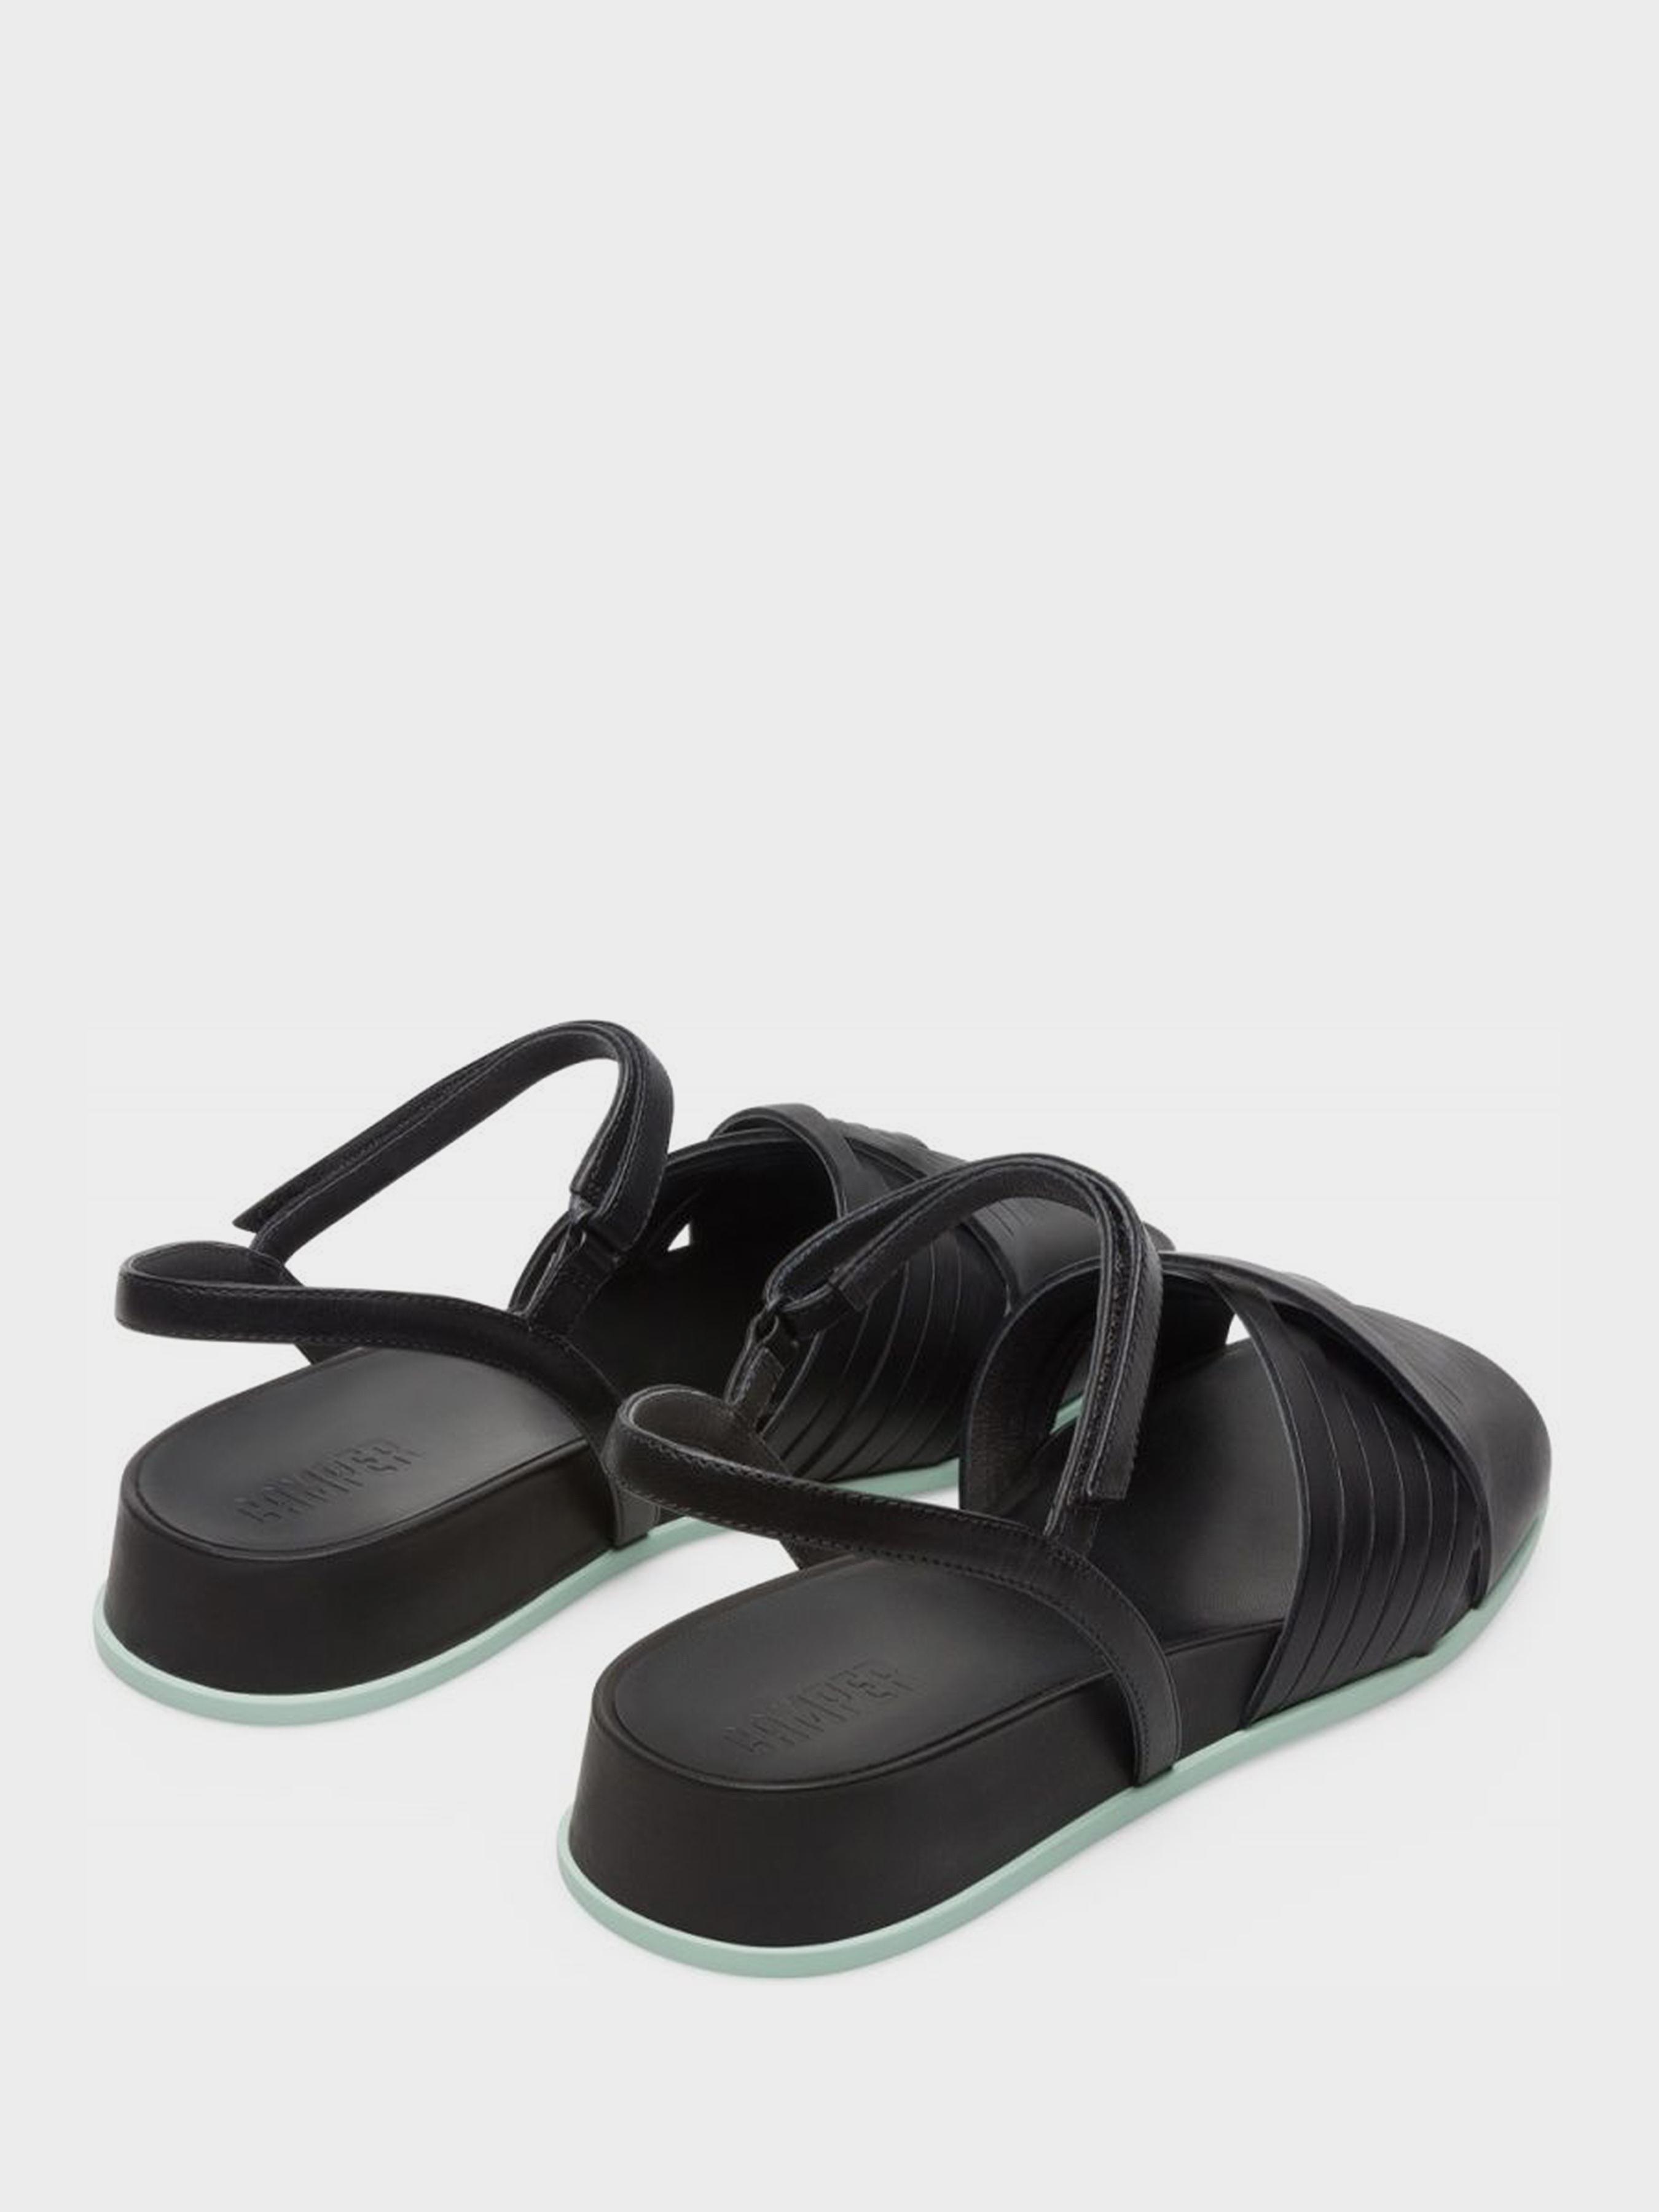 Сандалии для женщин Camper Atonika AW1001 размеры обуви, 2017